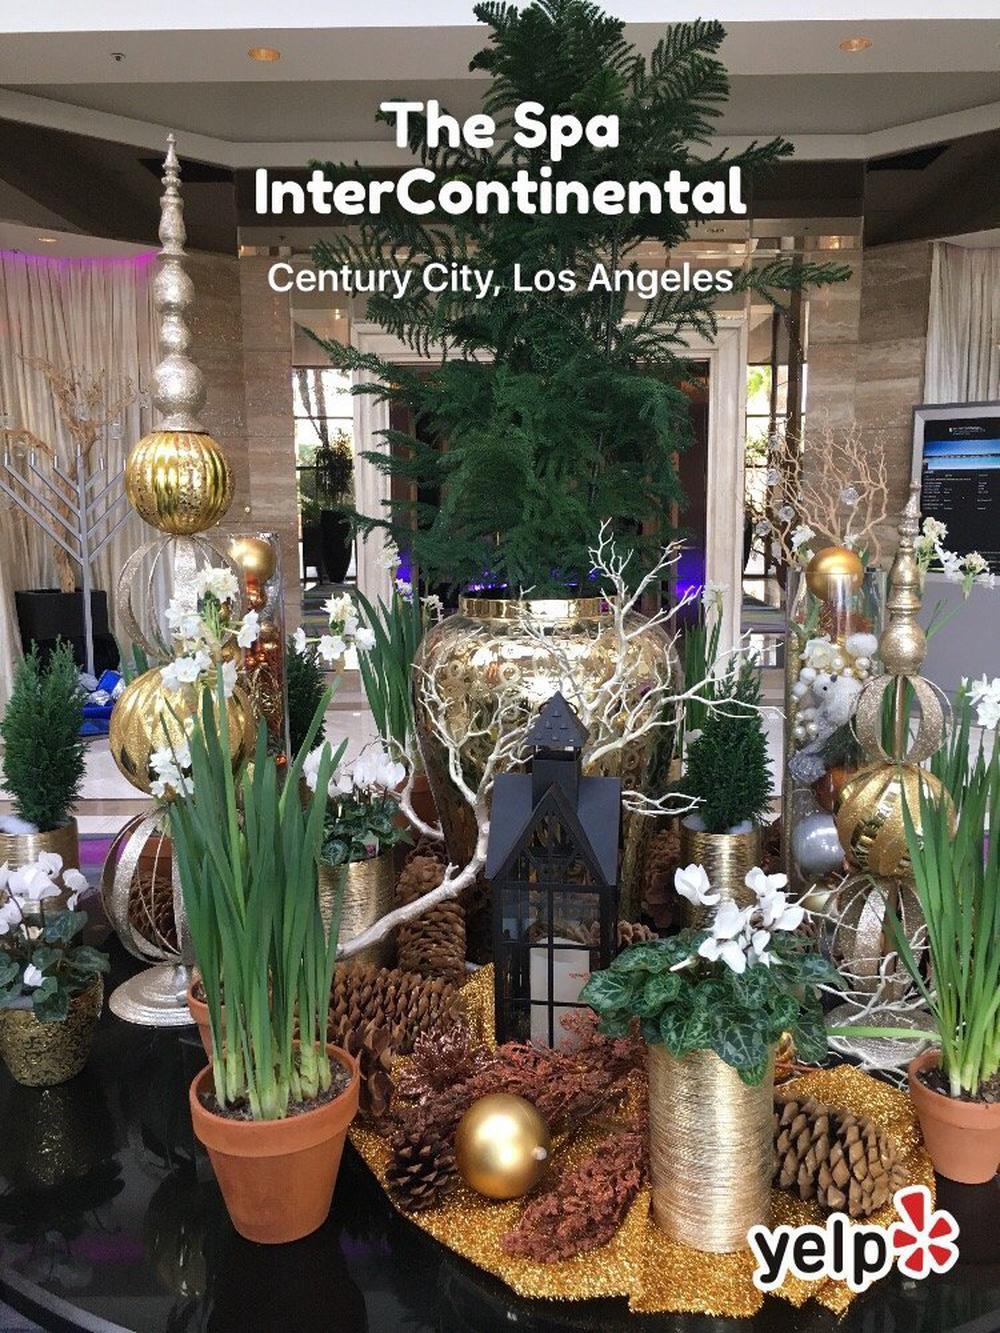 The Spa InterContinental